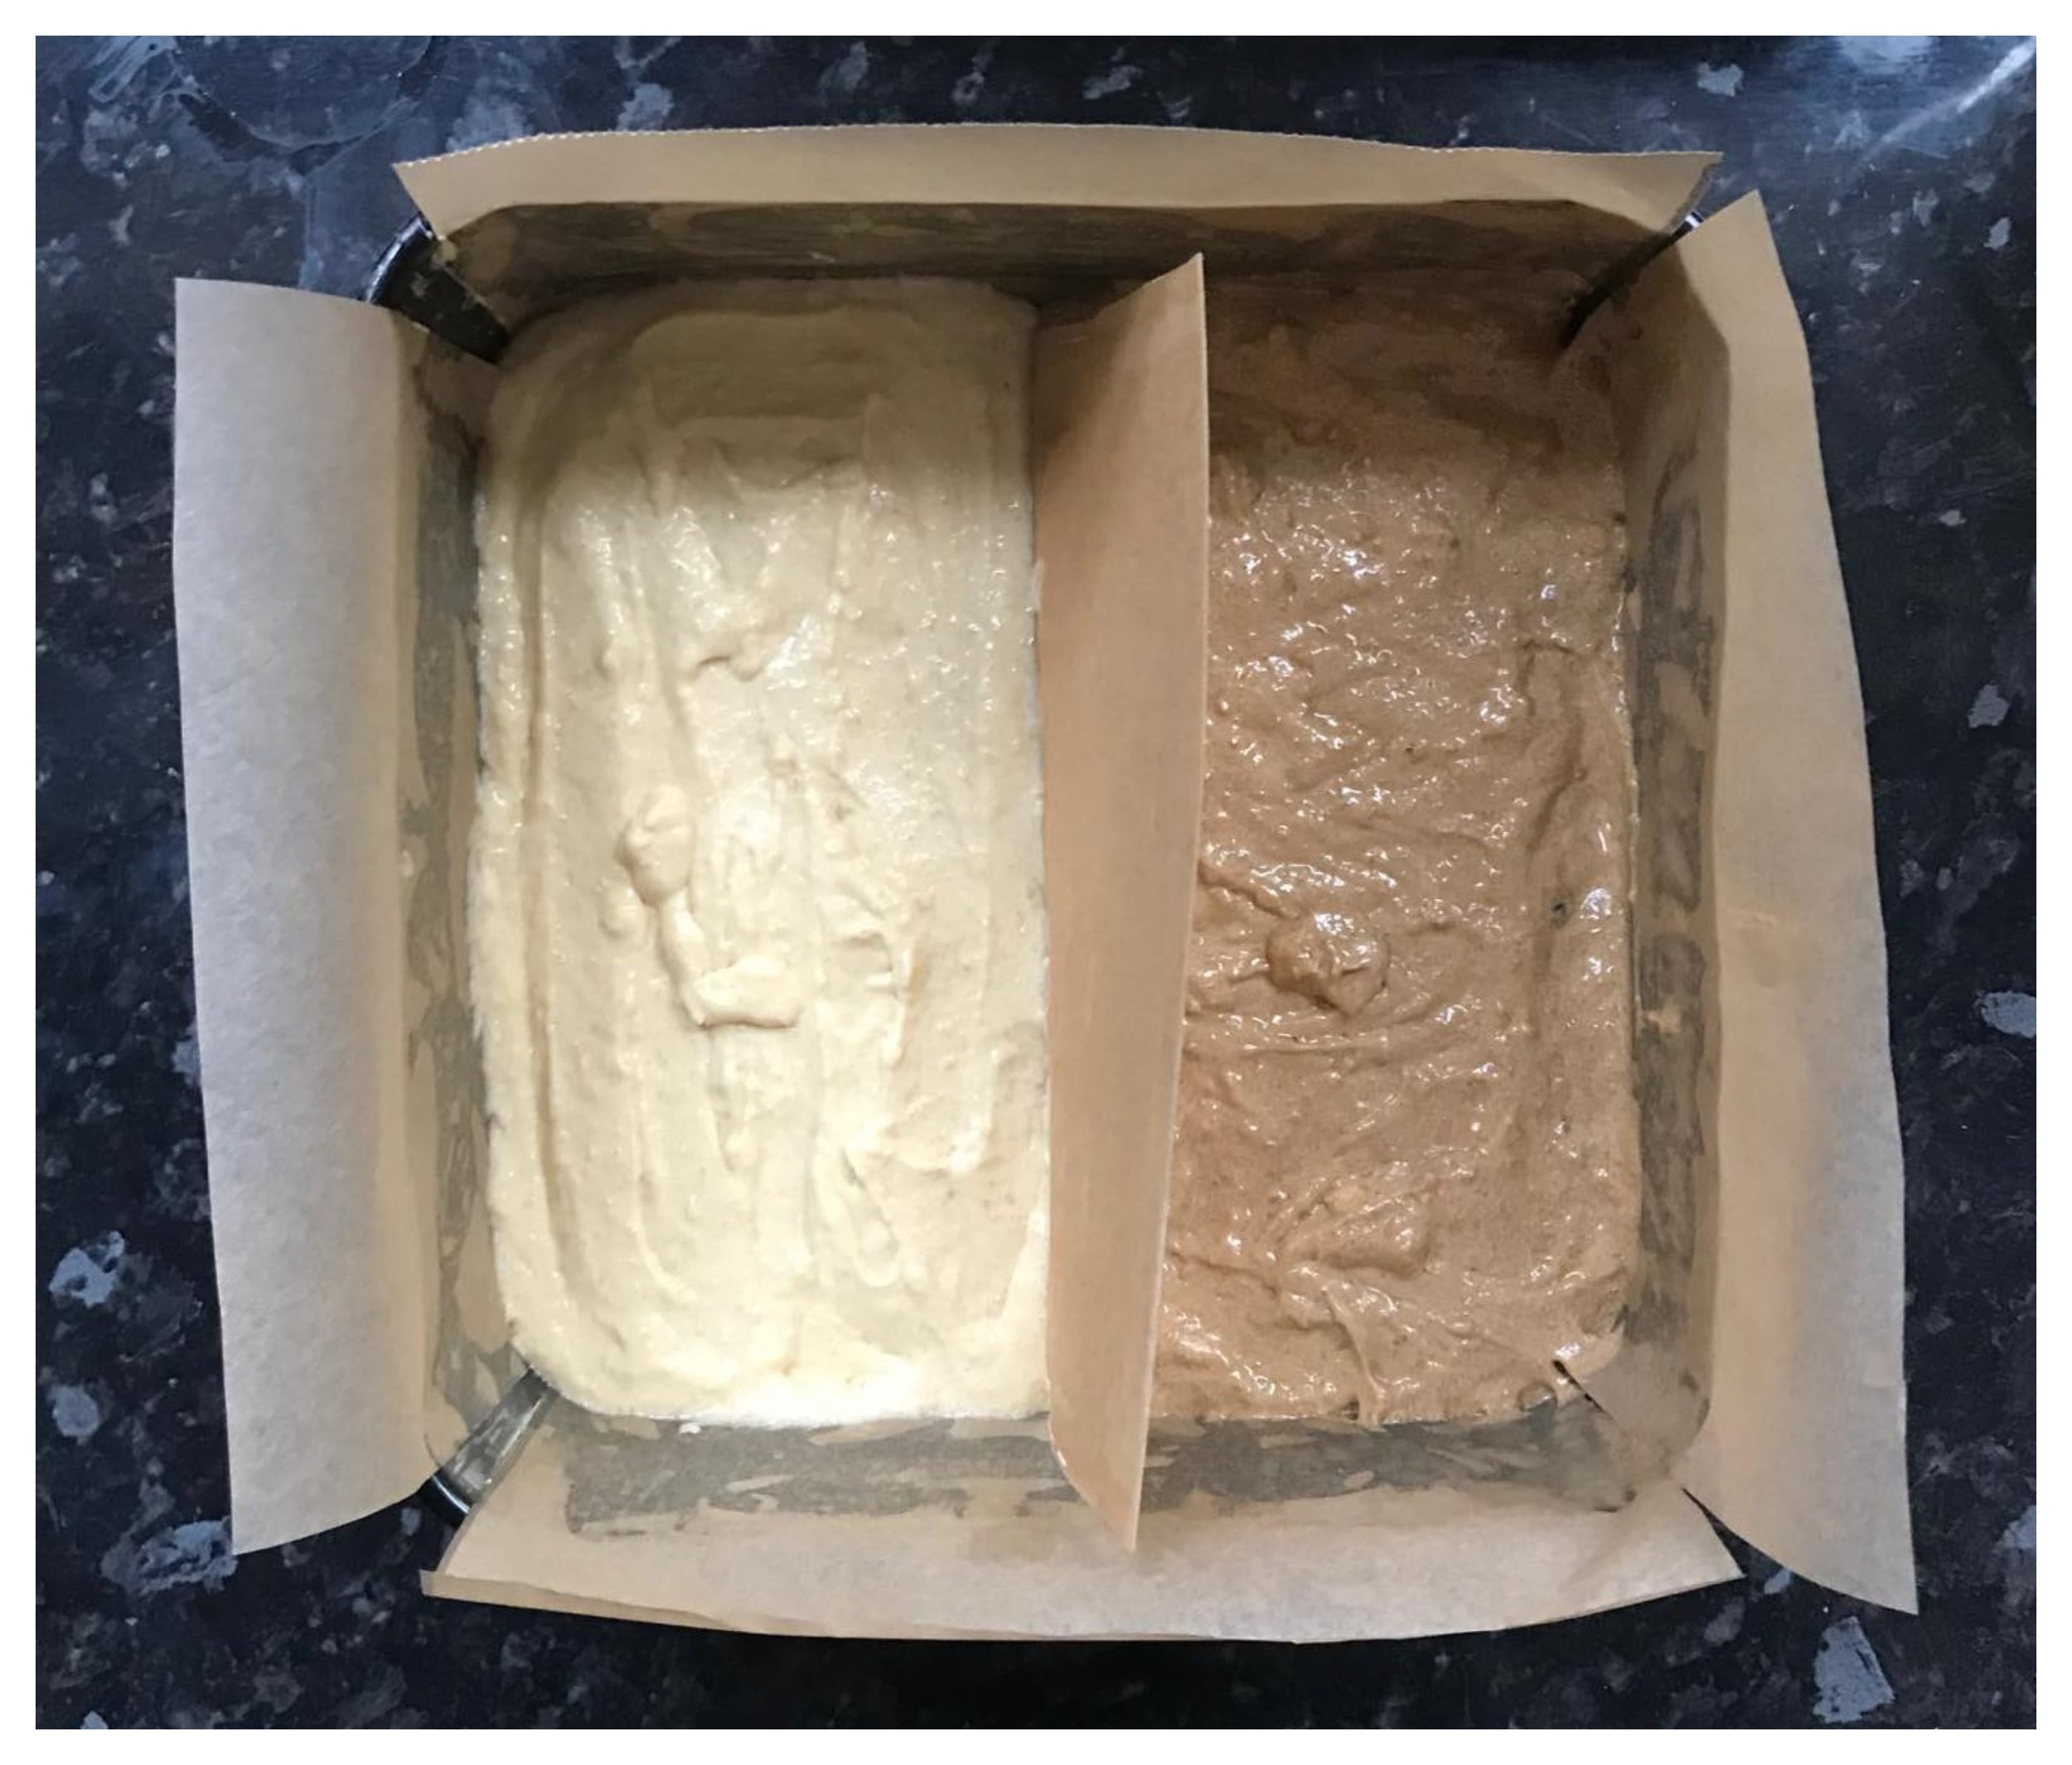 GBBO Technical Challenge S2W1 -  Coffee and Walnut Battenberg Cake